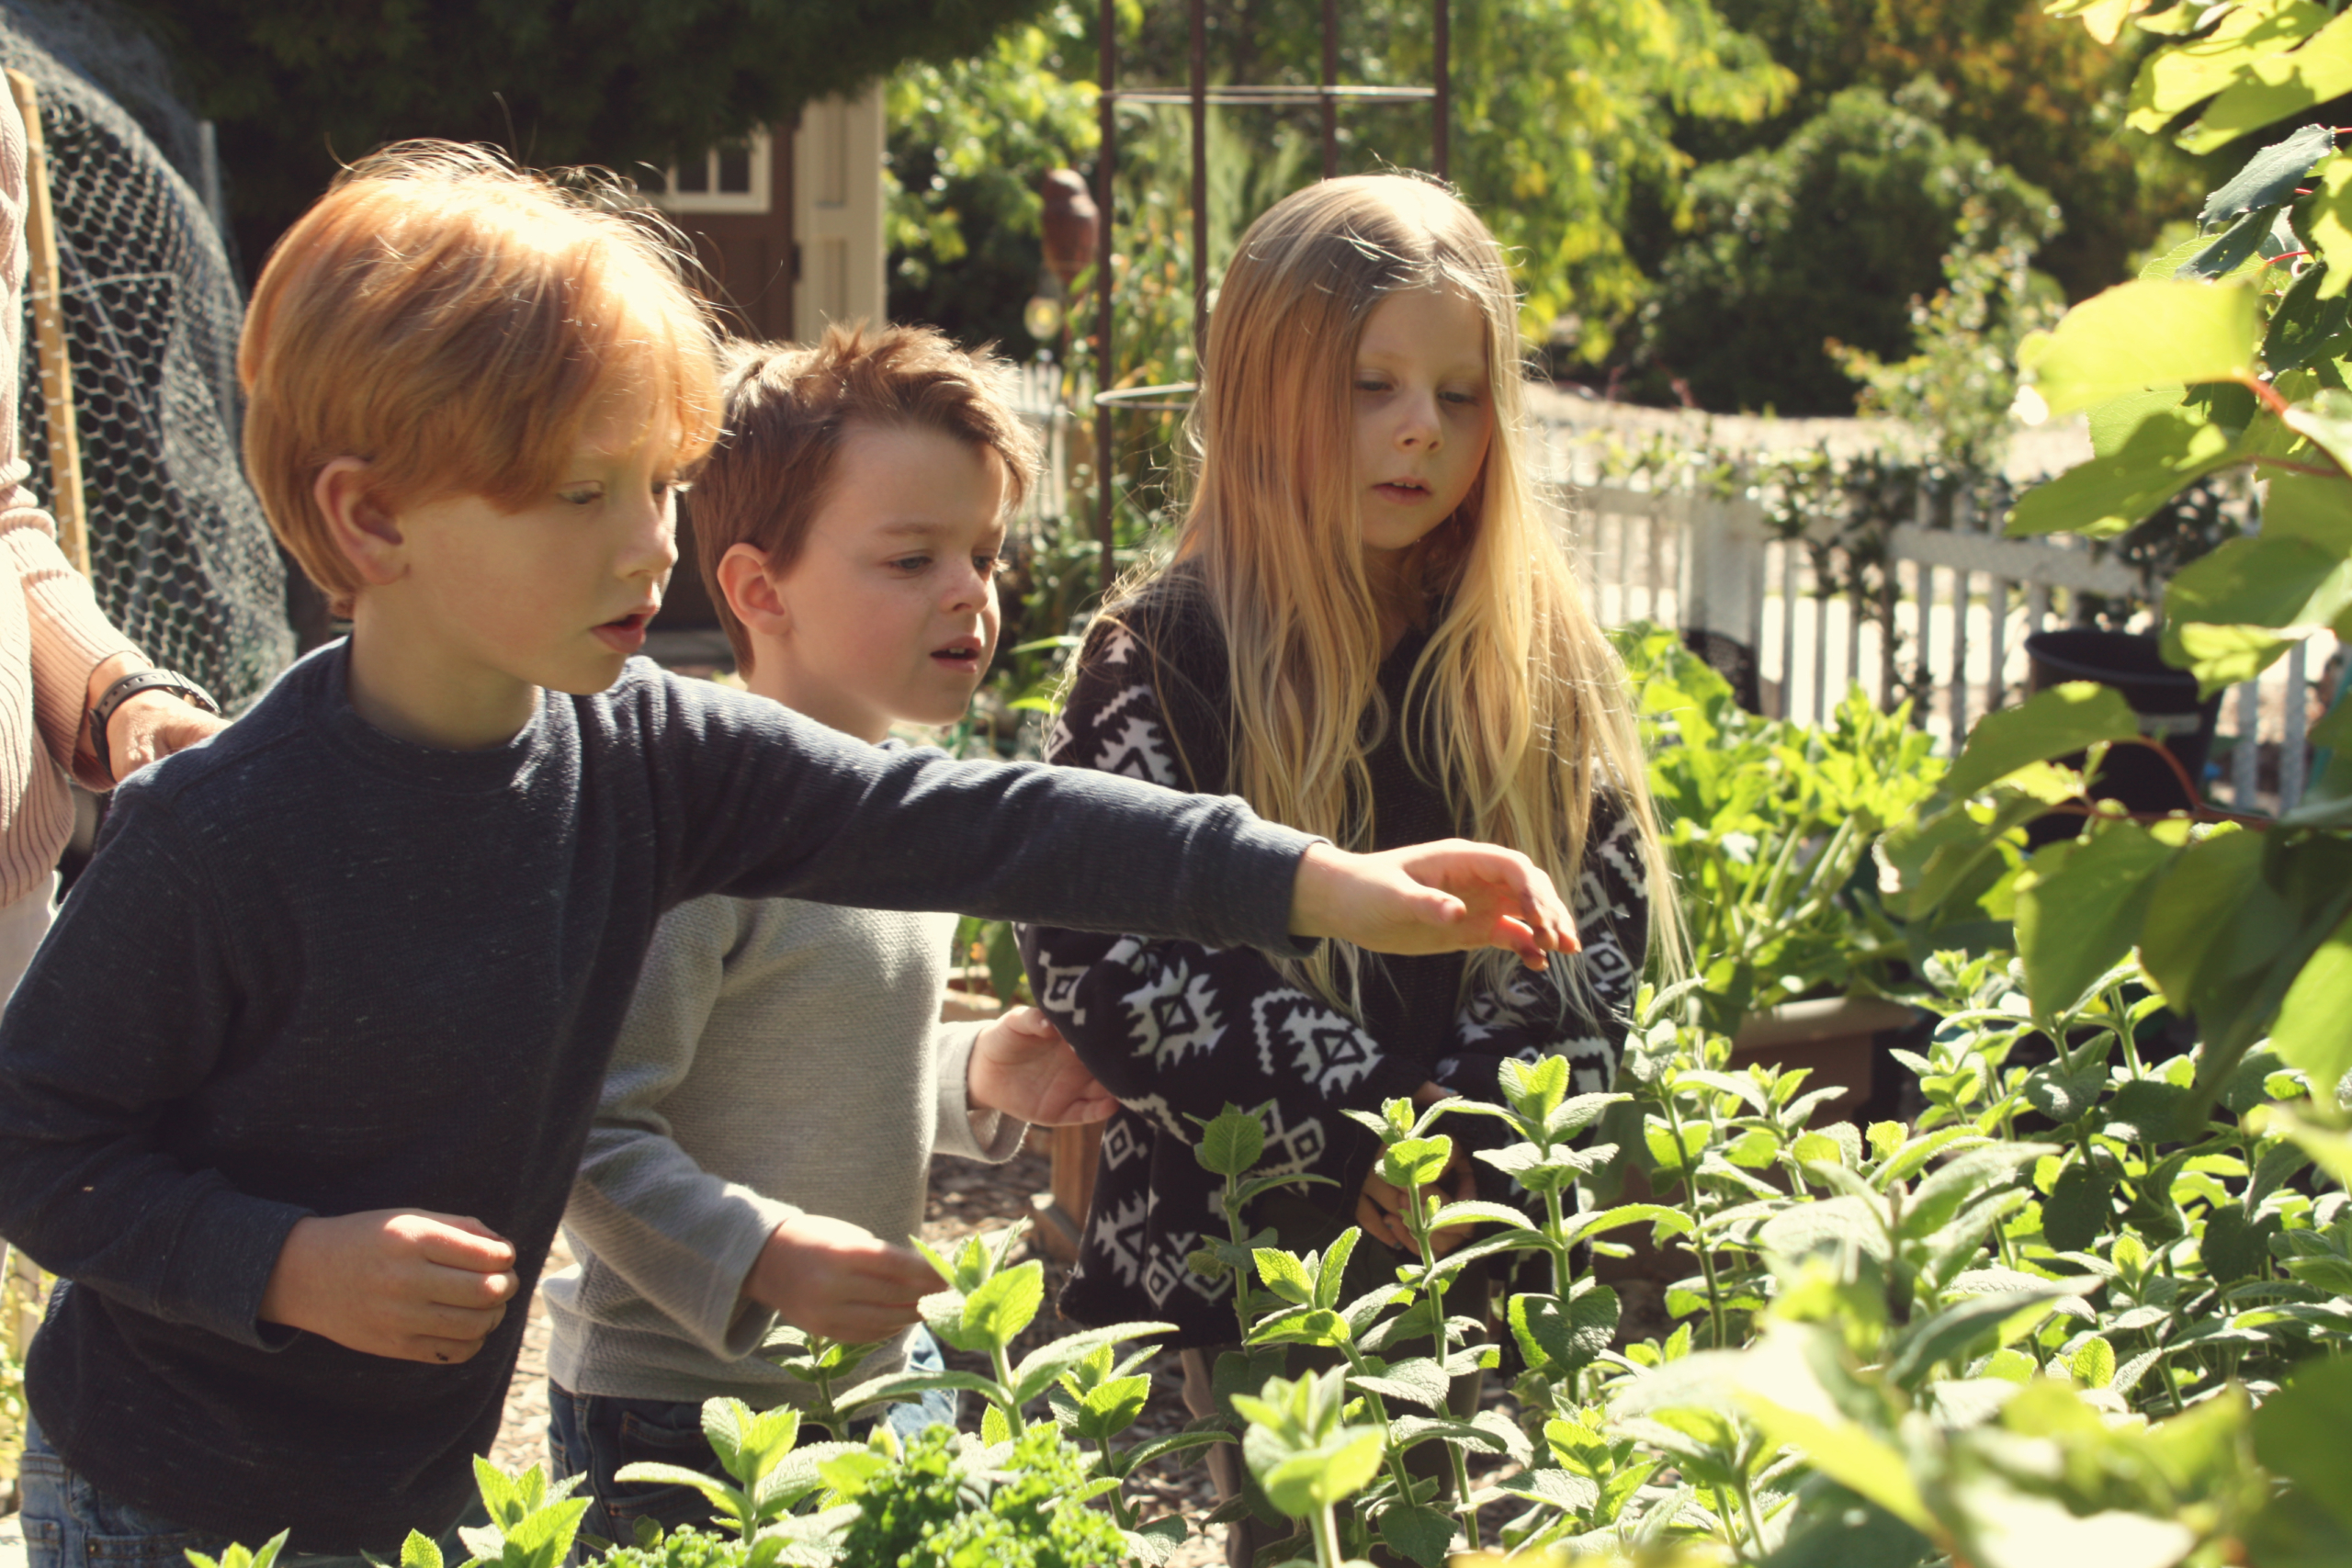 Children in the Anne Sullivan Preschool and Kindergarten Garden